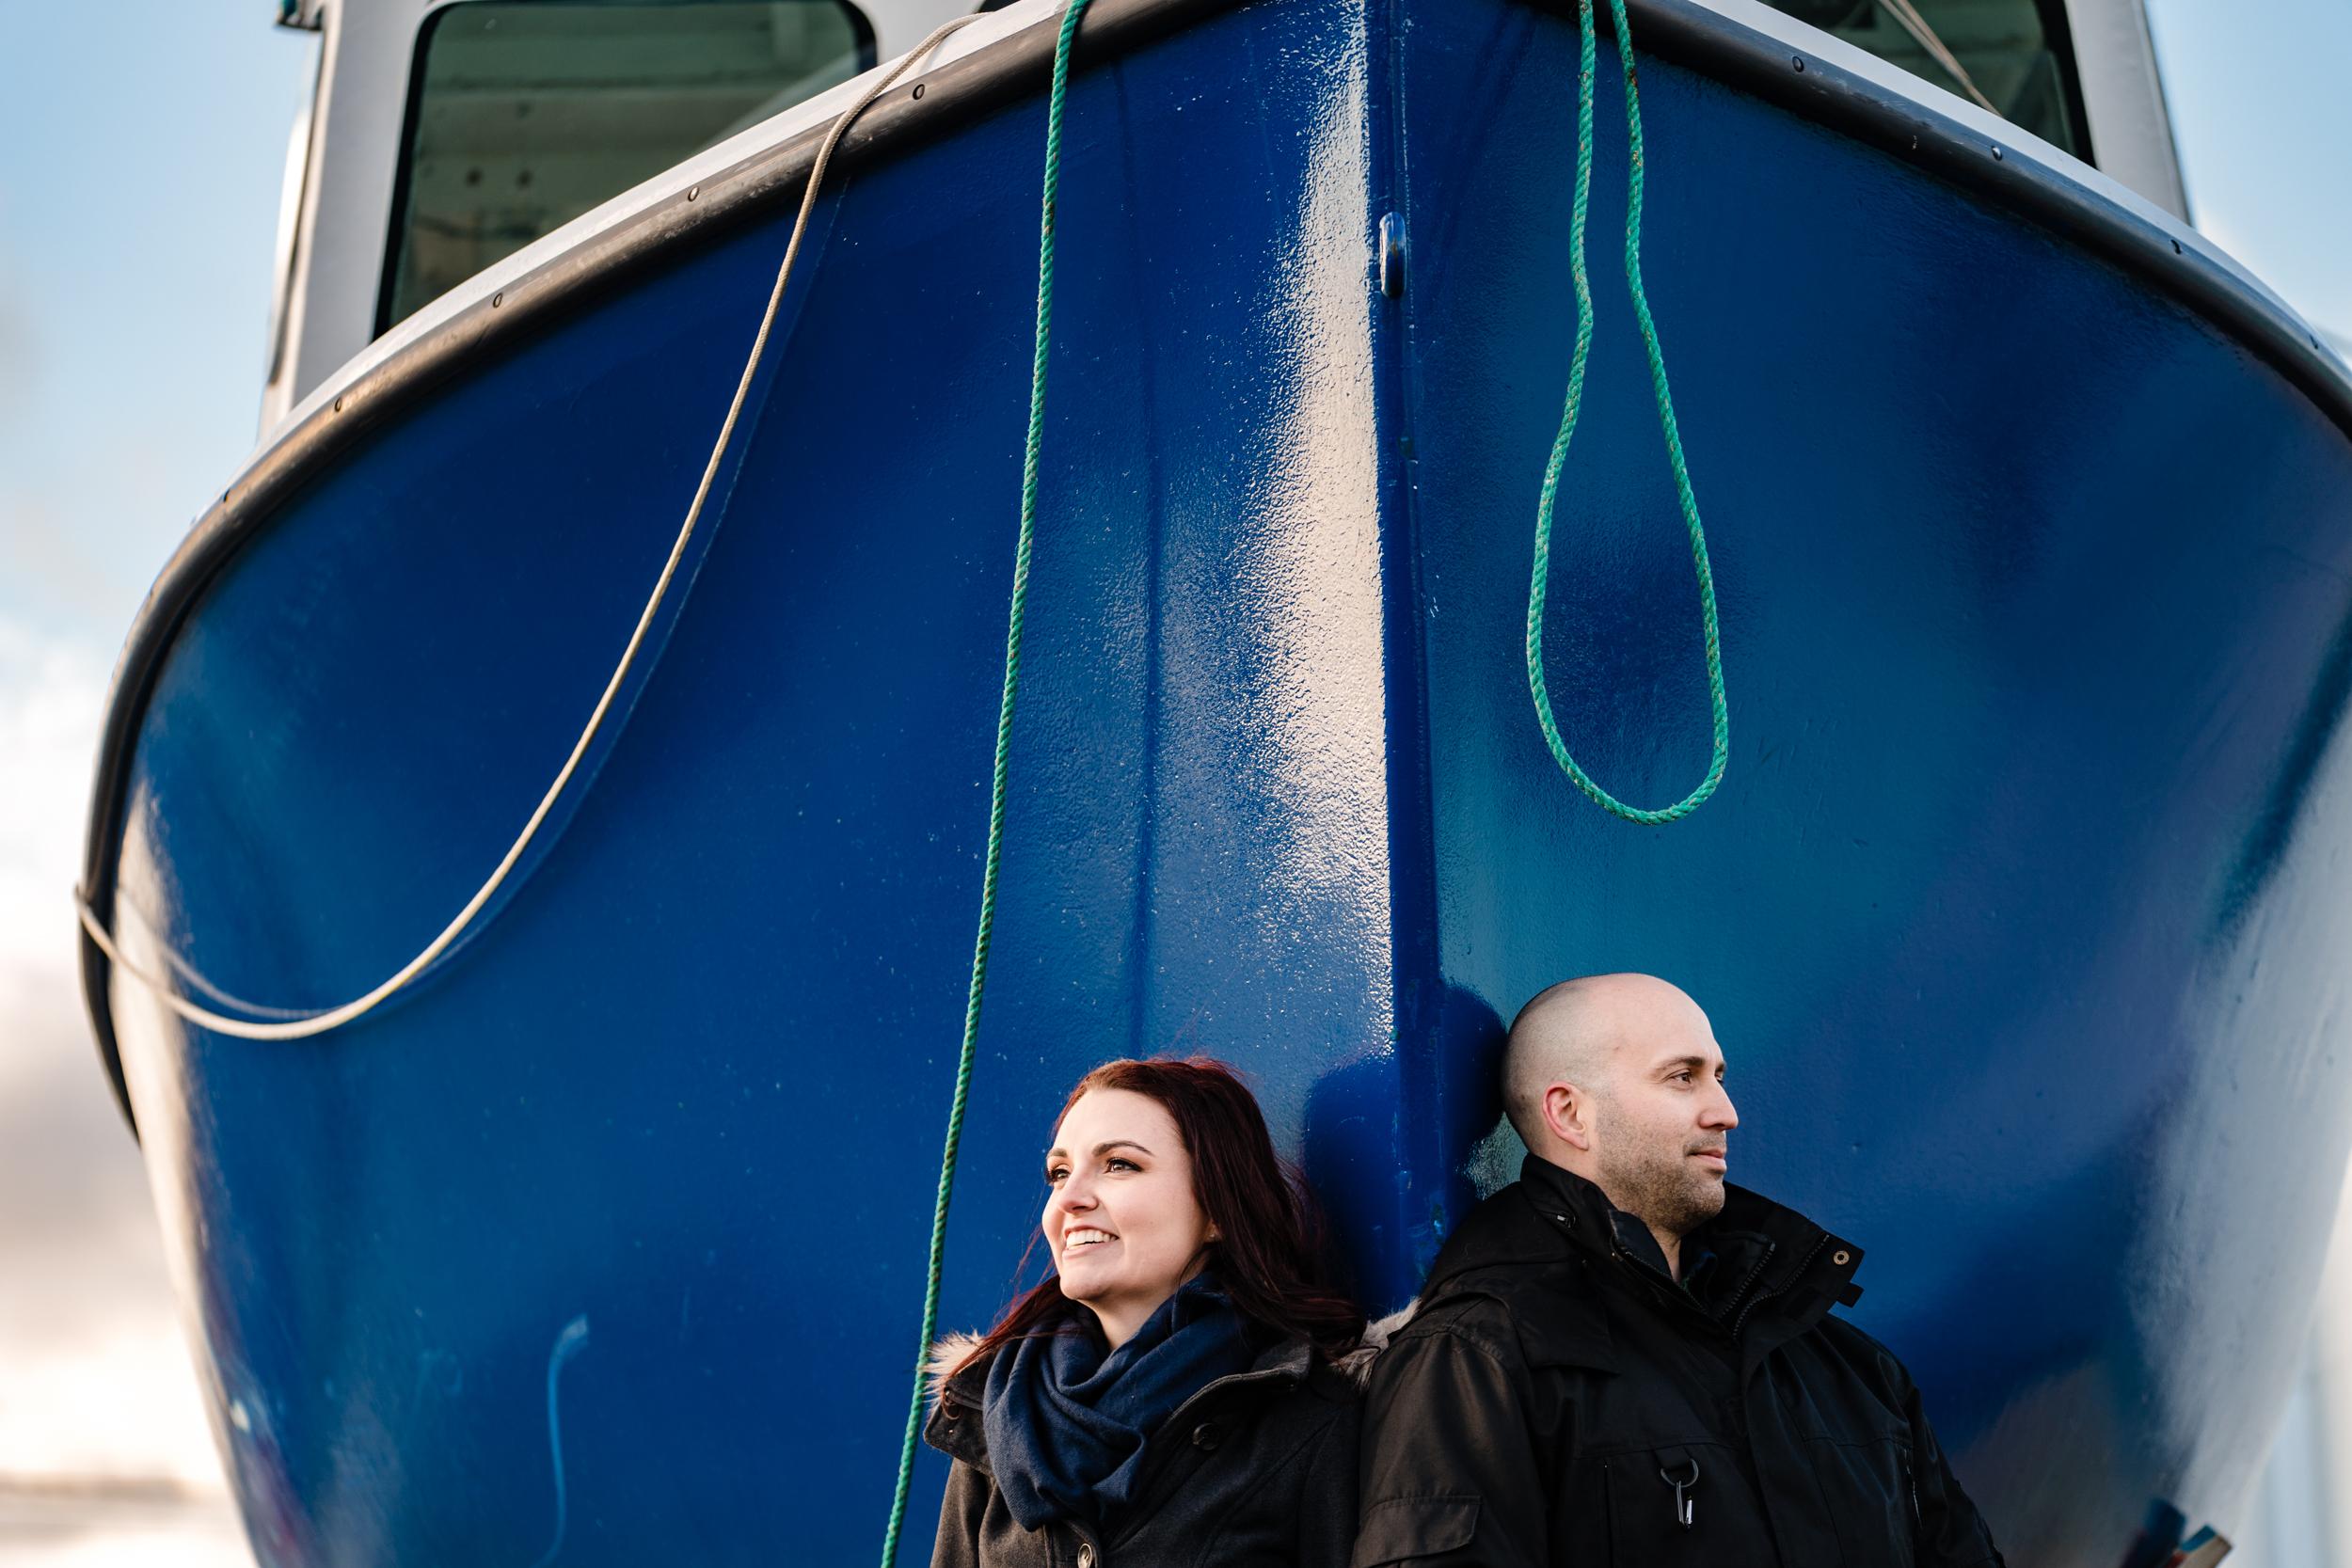 Sarah&Shayne-Halifax-engagement-weddingphotography-weddingphotographers-novascotia (14 of 41).jpg